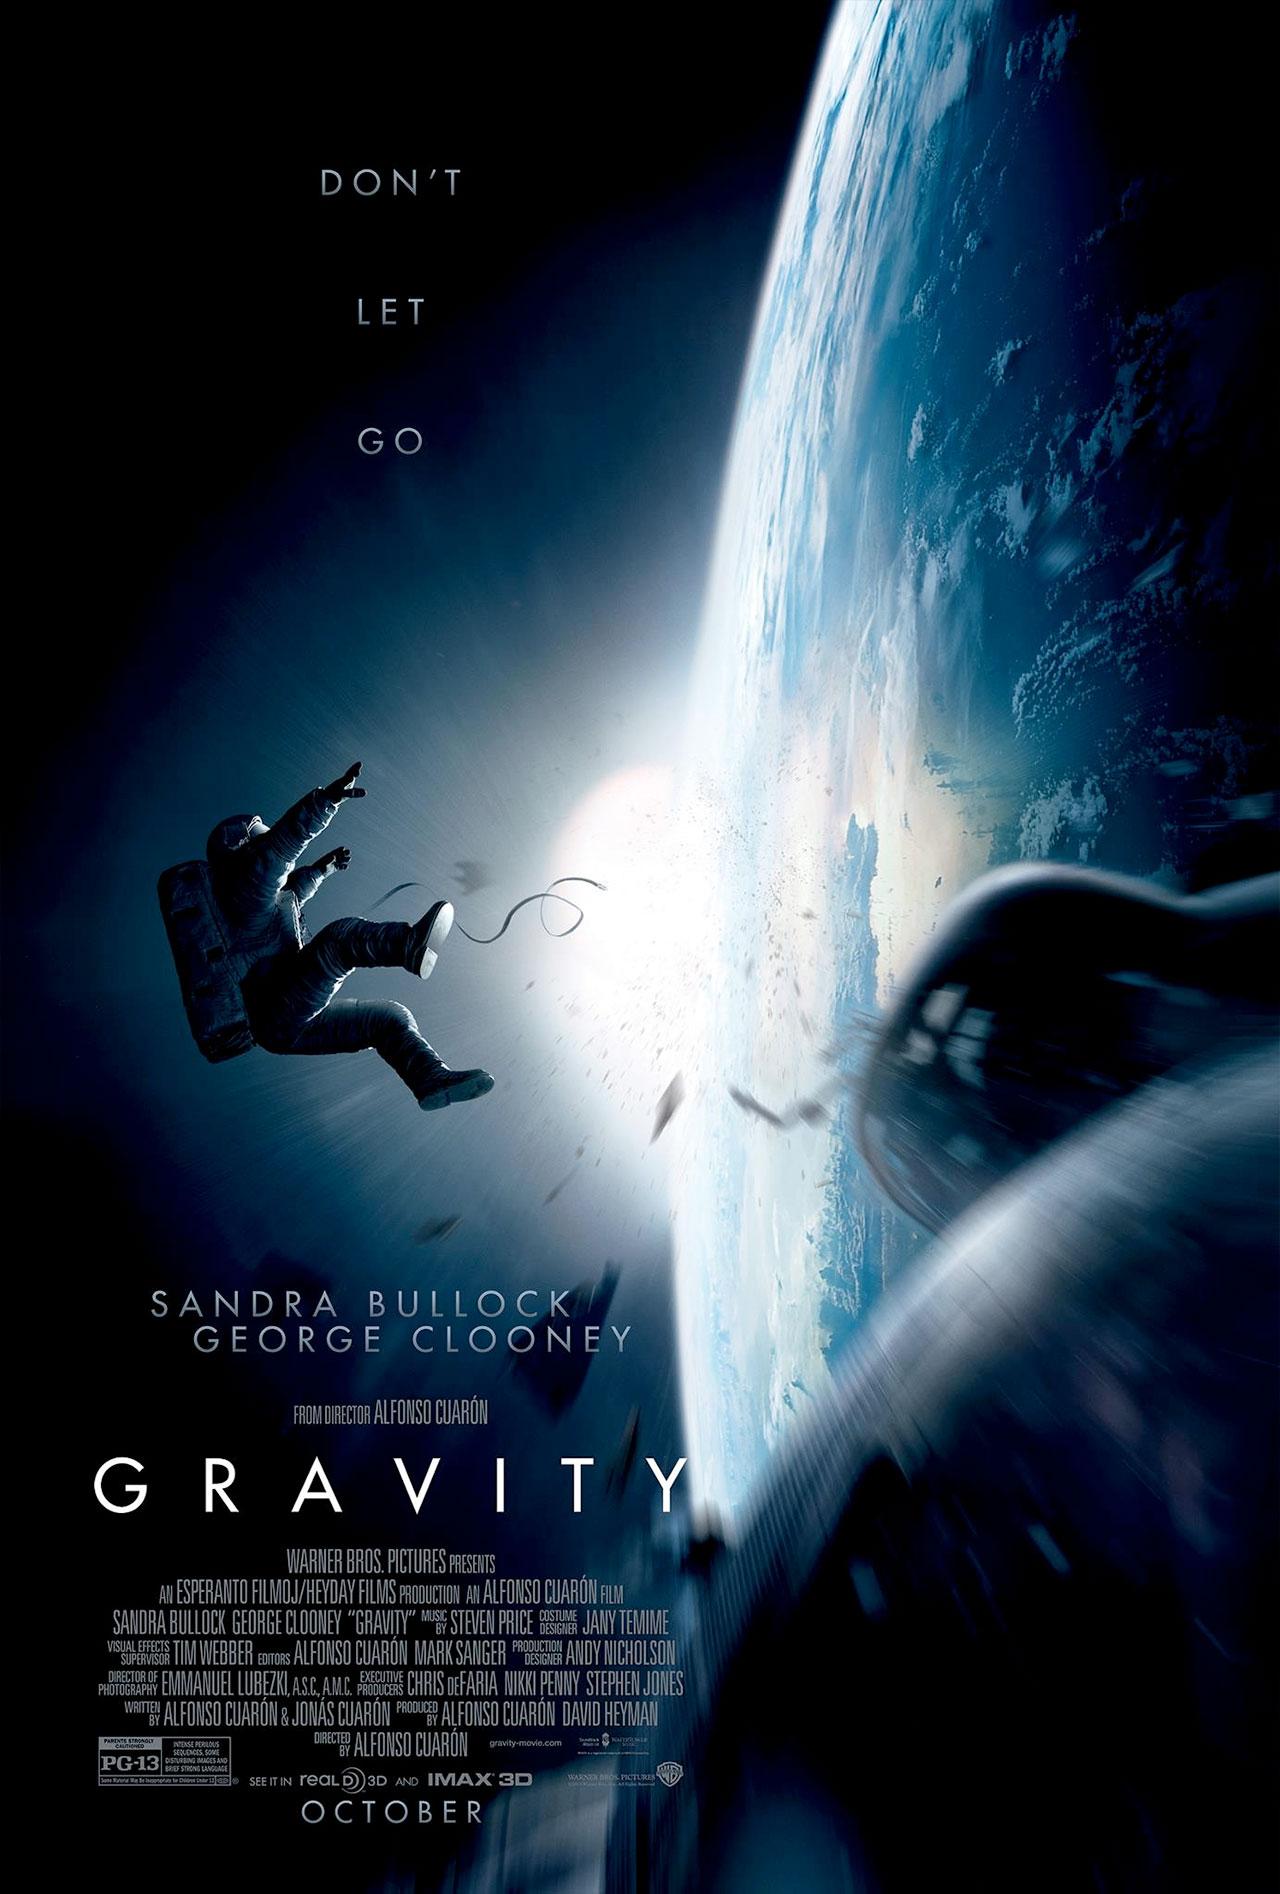 Gravity Film Trailer Reveals George Clooney Sandra Bullock As Astronauts Space